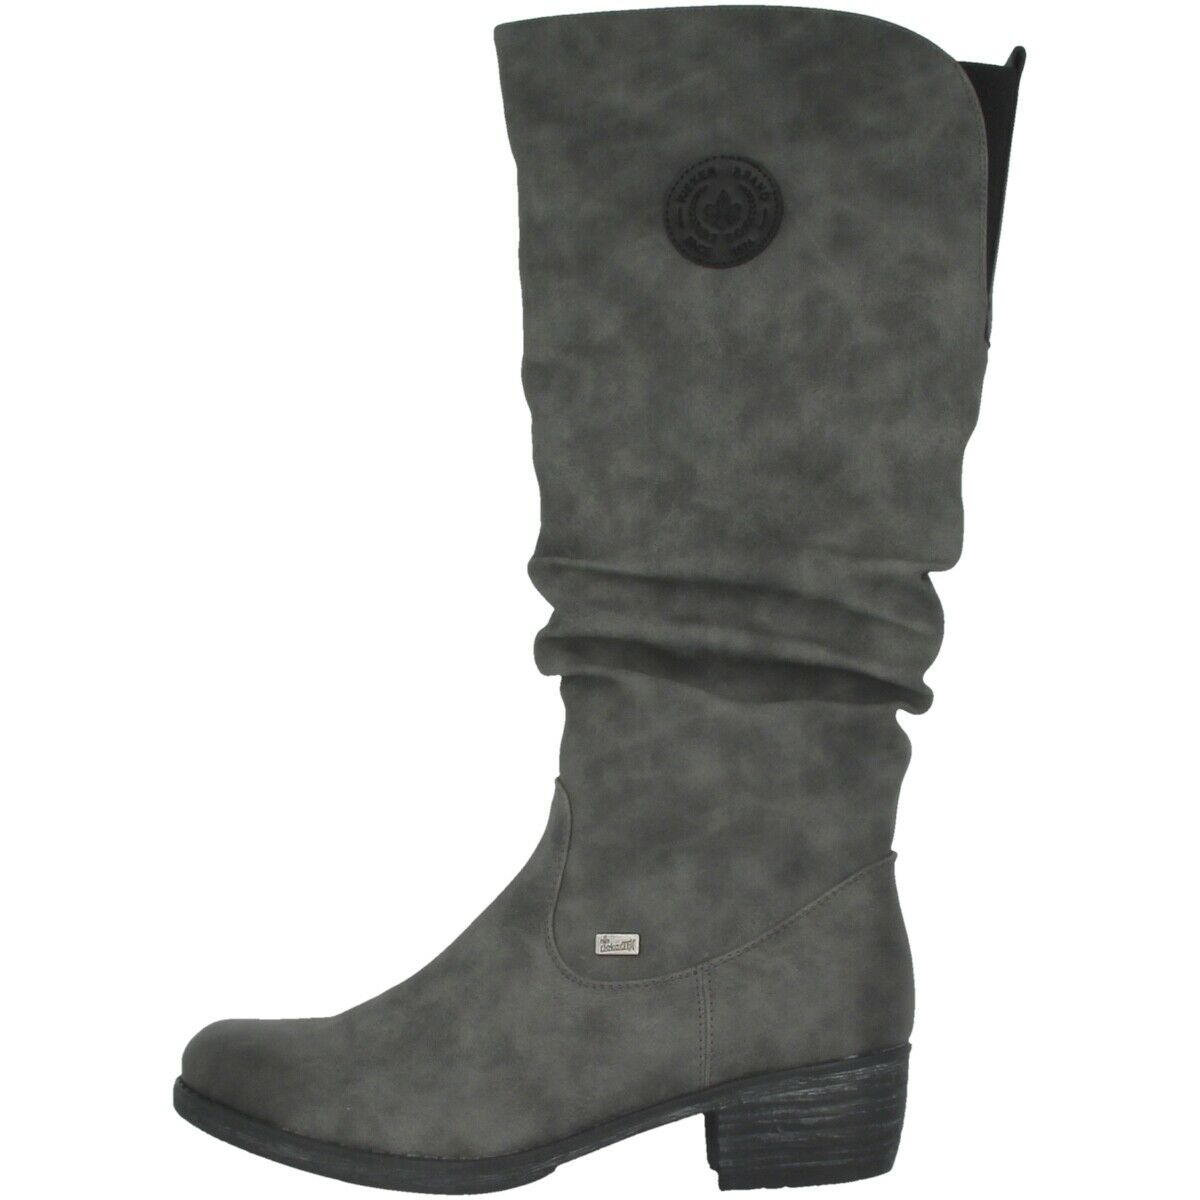 Rieker Morelia-Tulum Stiefel Antistress Damen Schuhe Winterstiefel 93157-45